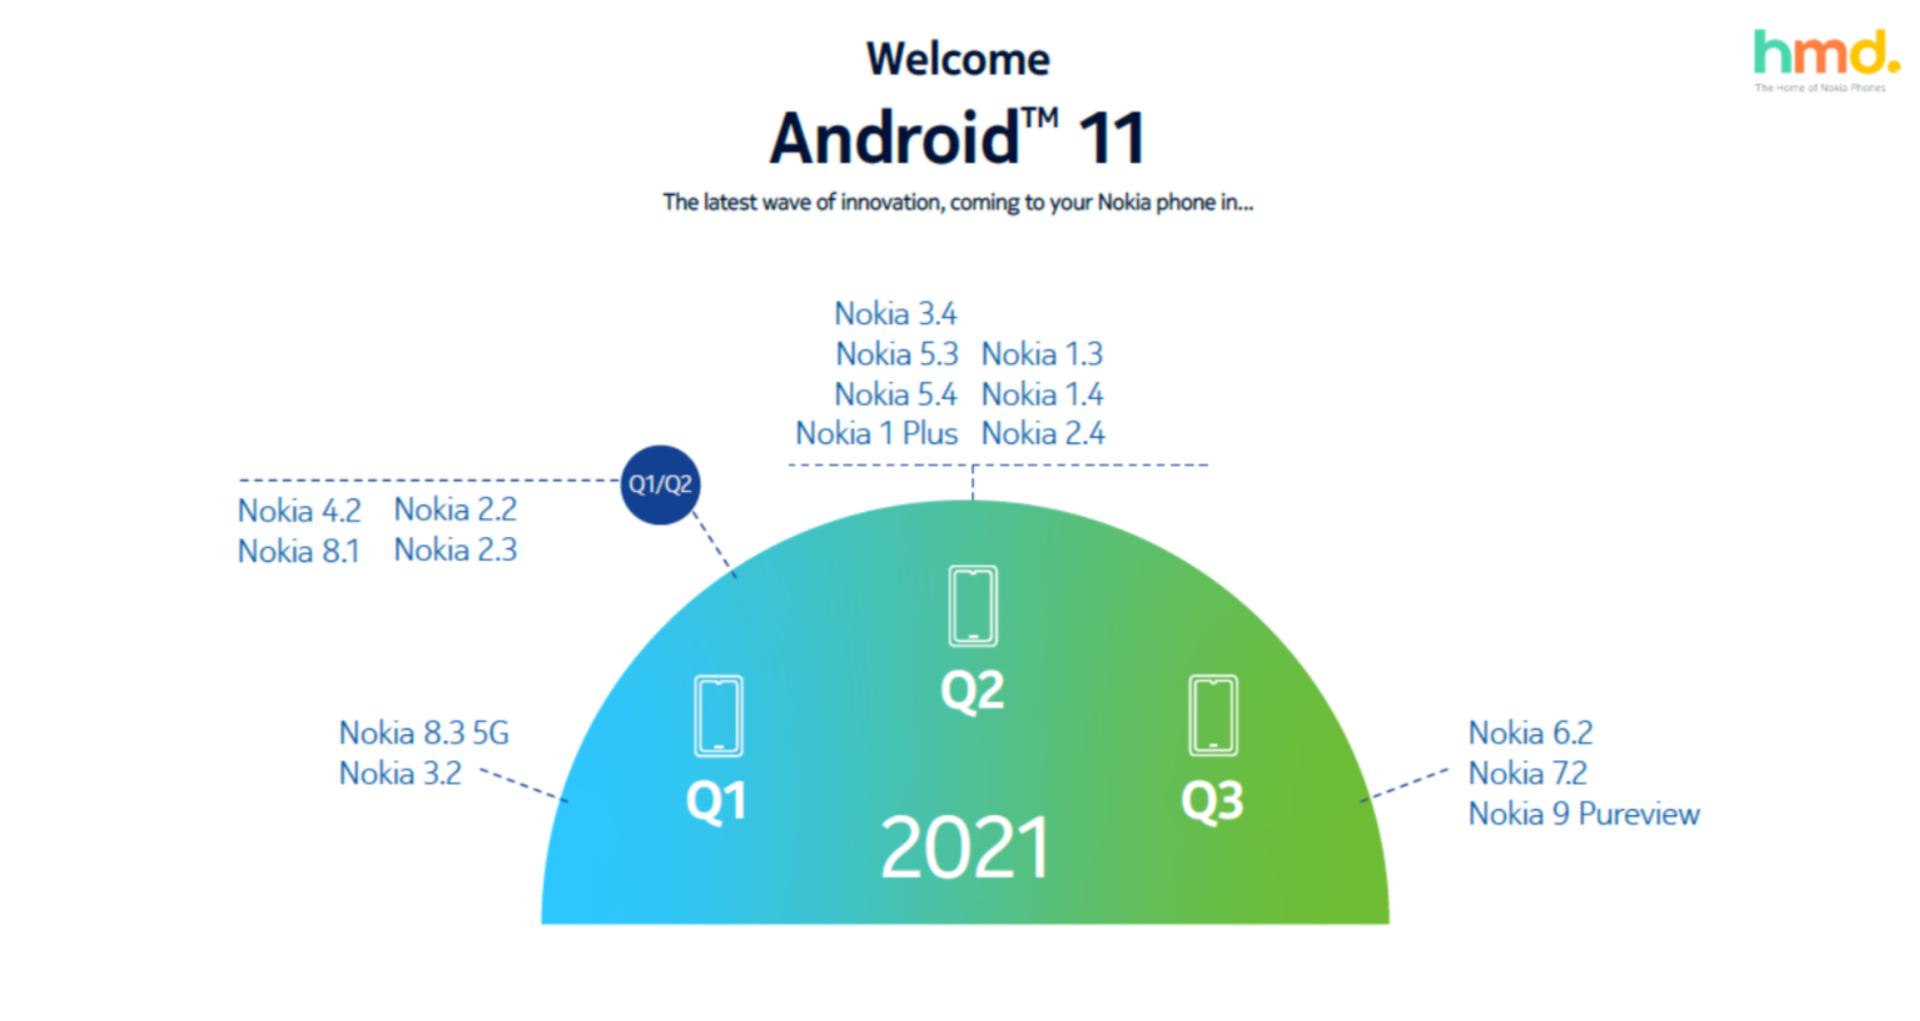 Nokia Android 11 rodmap